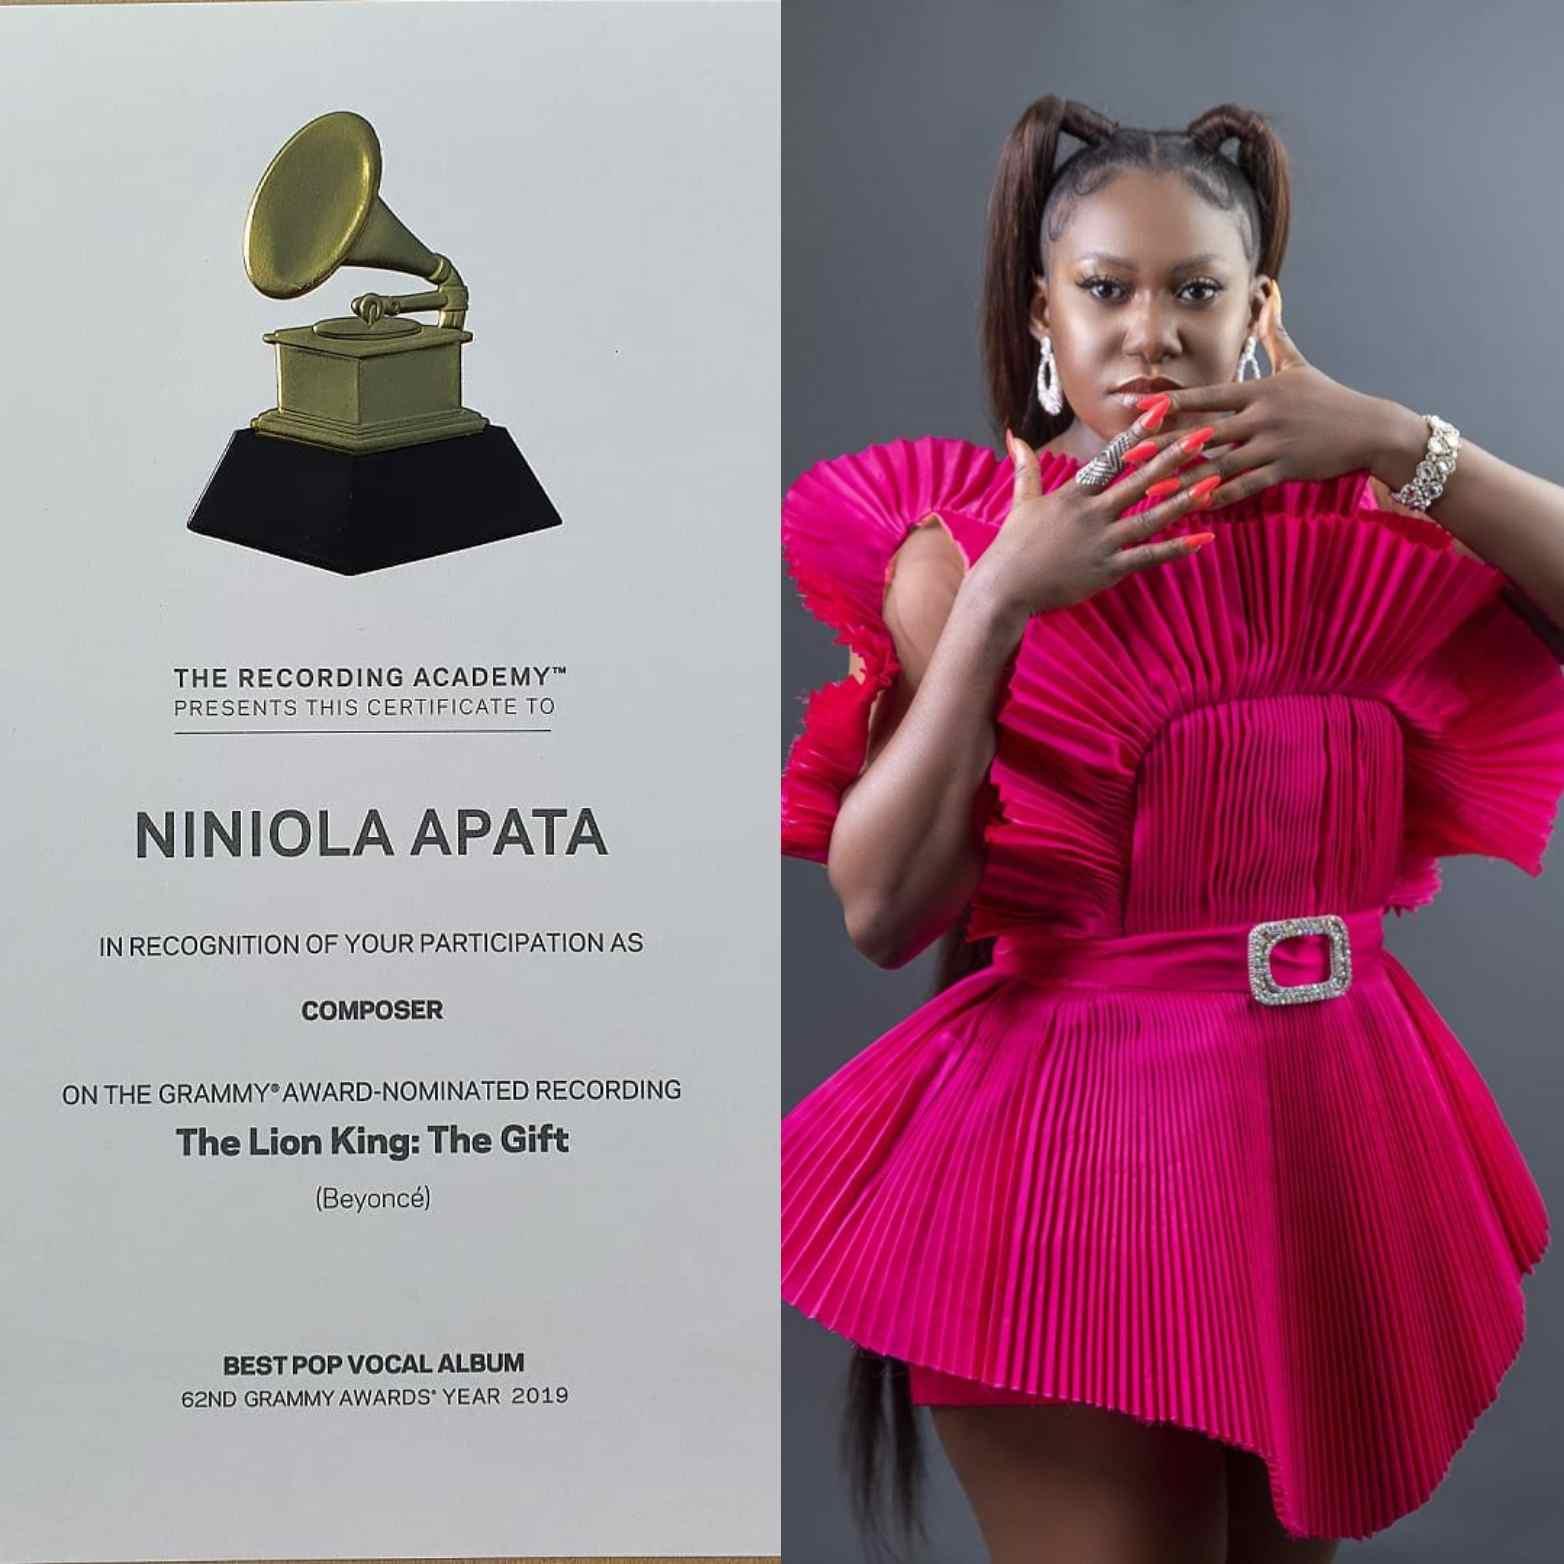 NINIOLA NIGERIAN MUSIC ARTISTE PICK UP GRAMMY AWARD